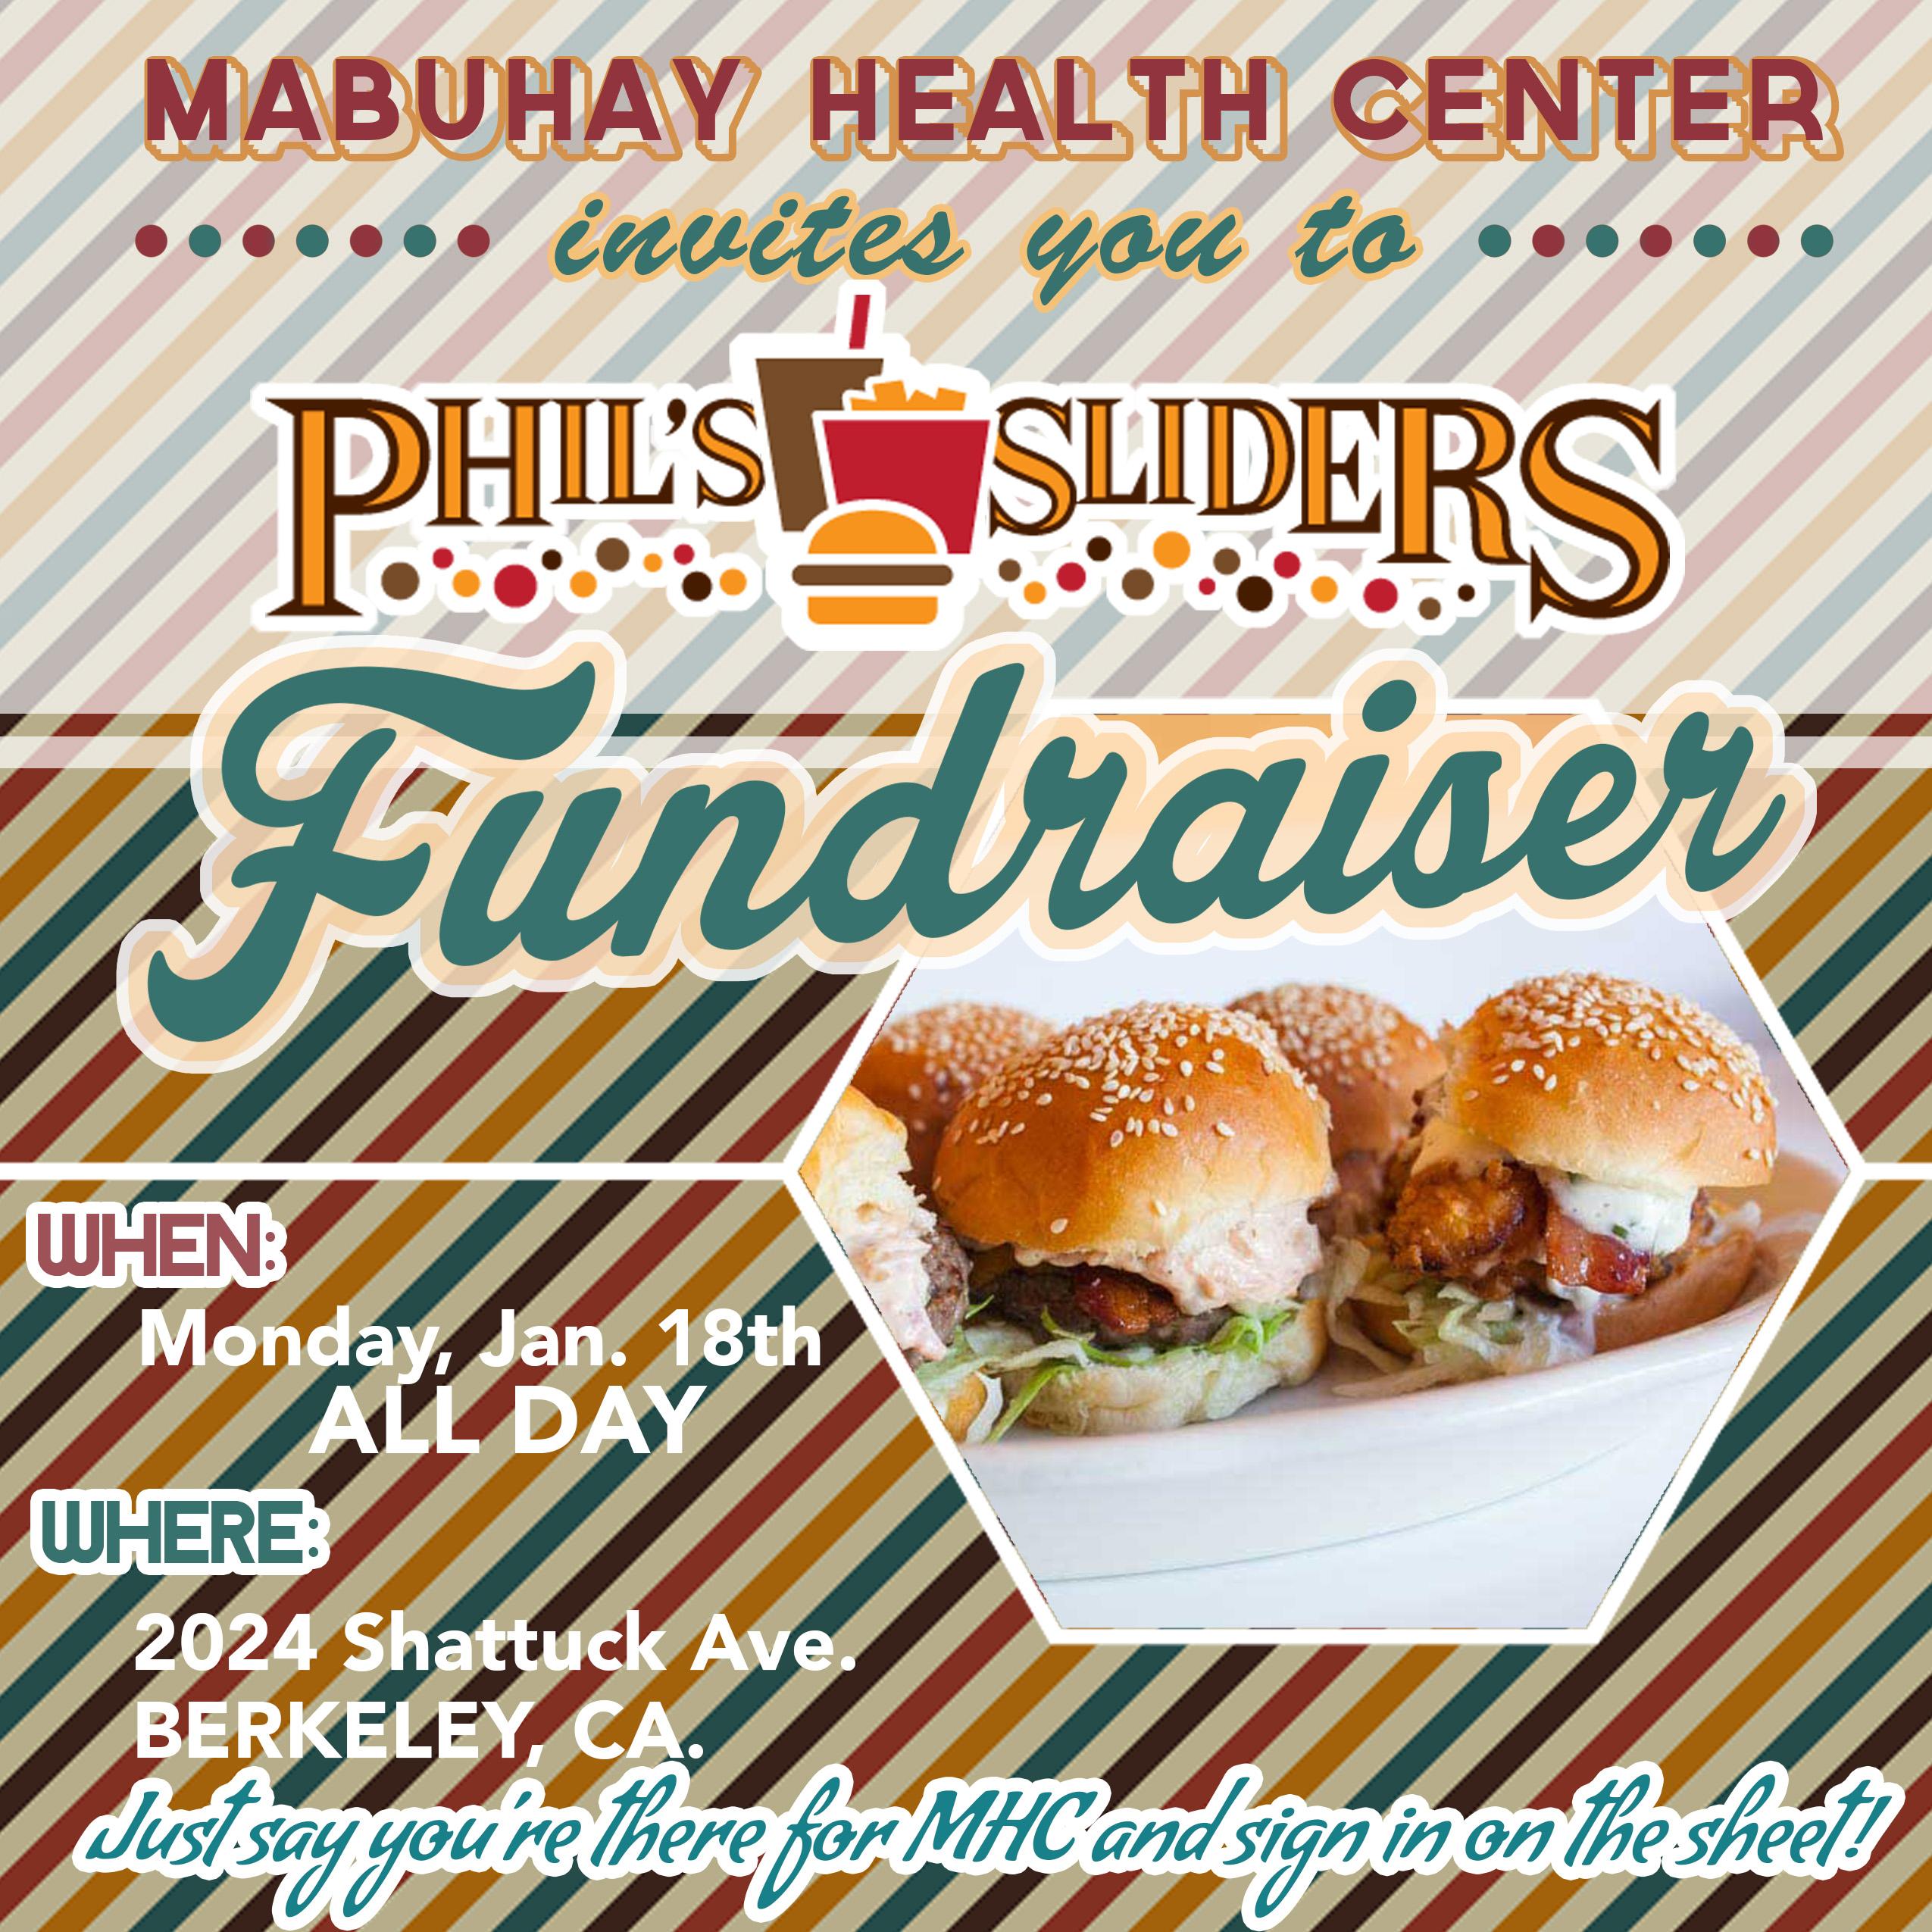 011816 Phil's Day post Mabuhay